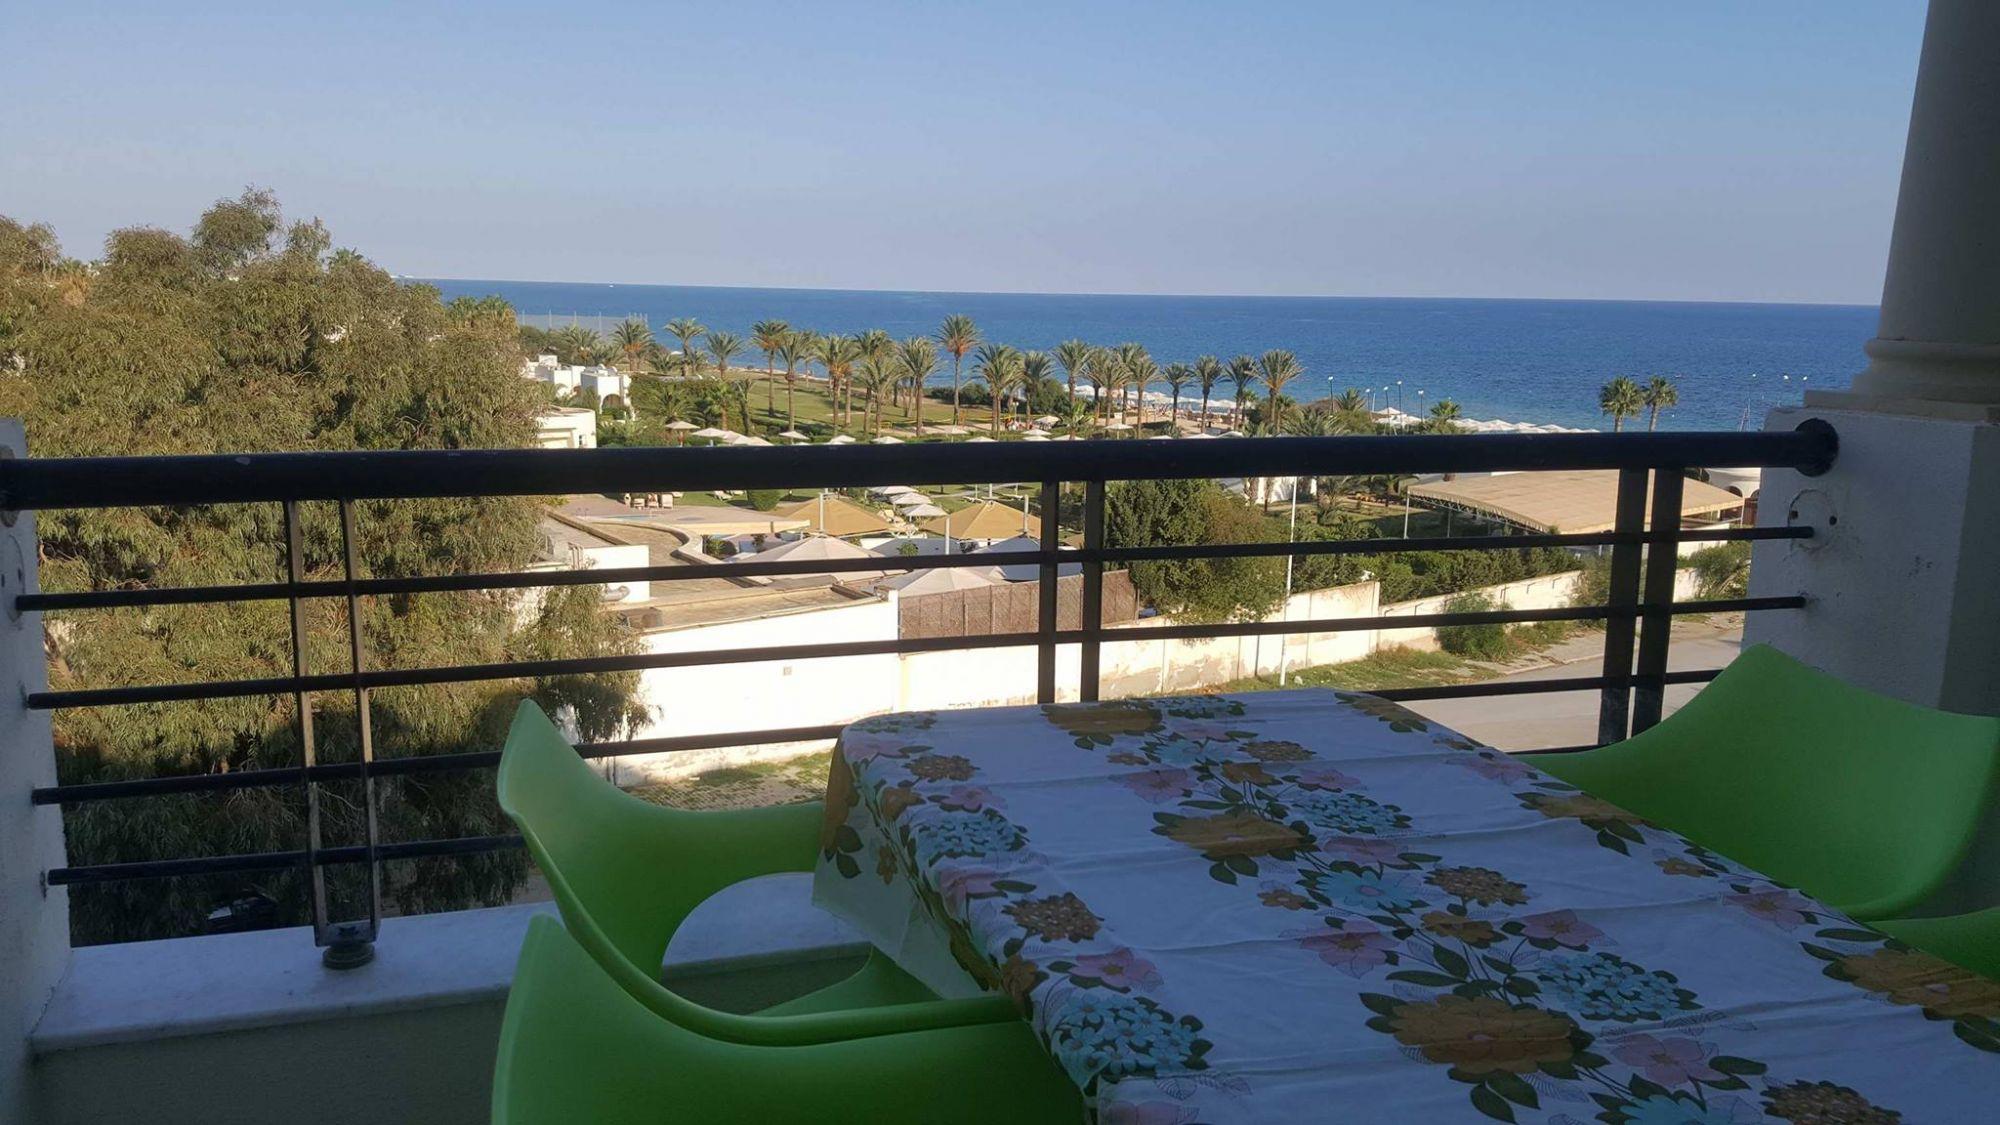 Appartement vue sur mer à hammamet nord